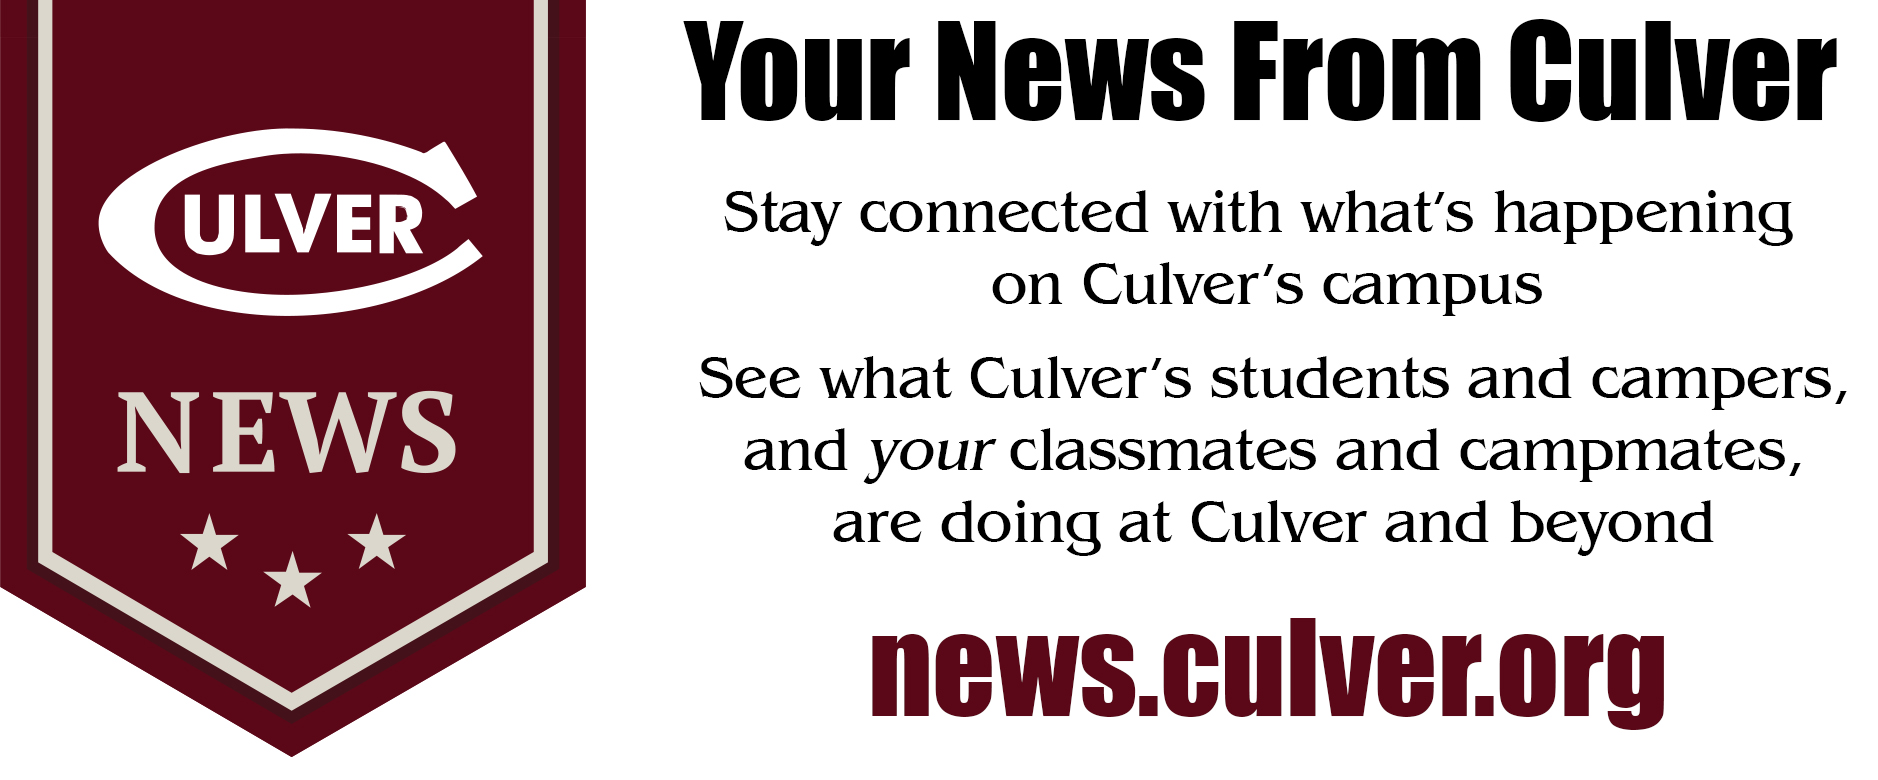 Culver News